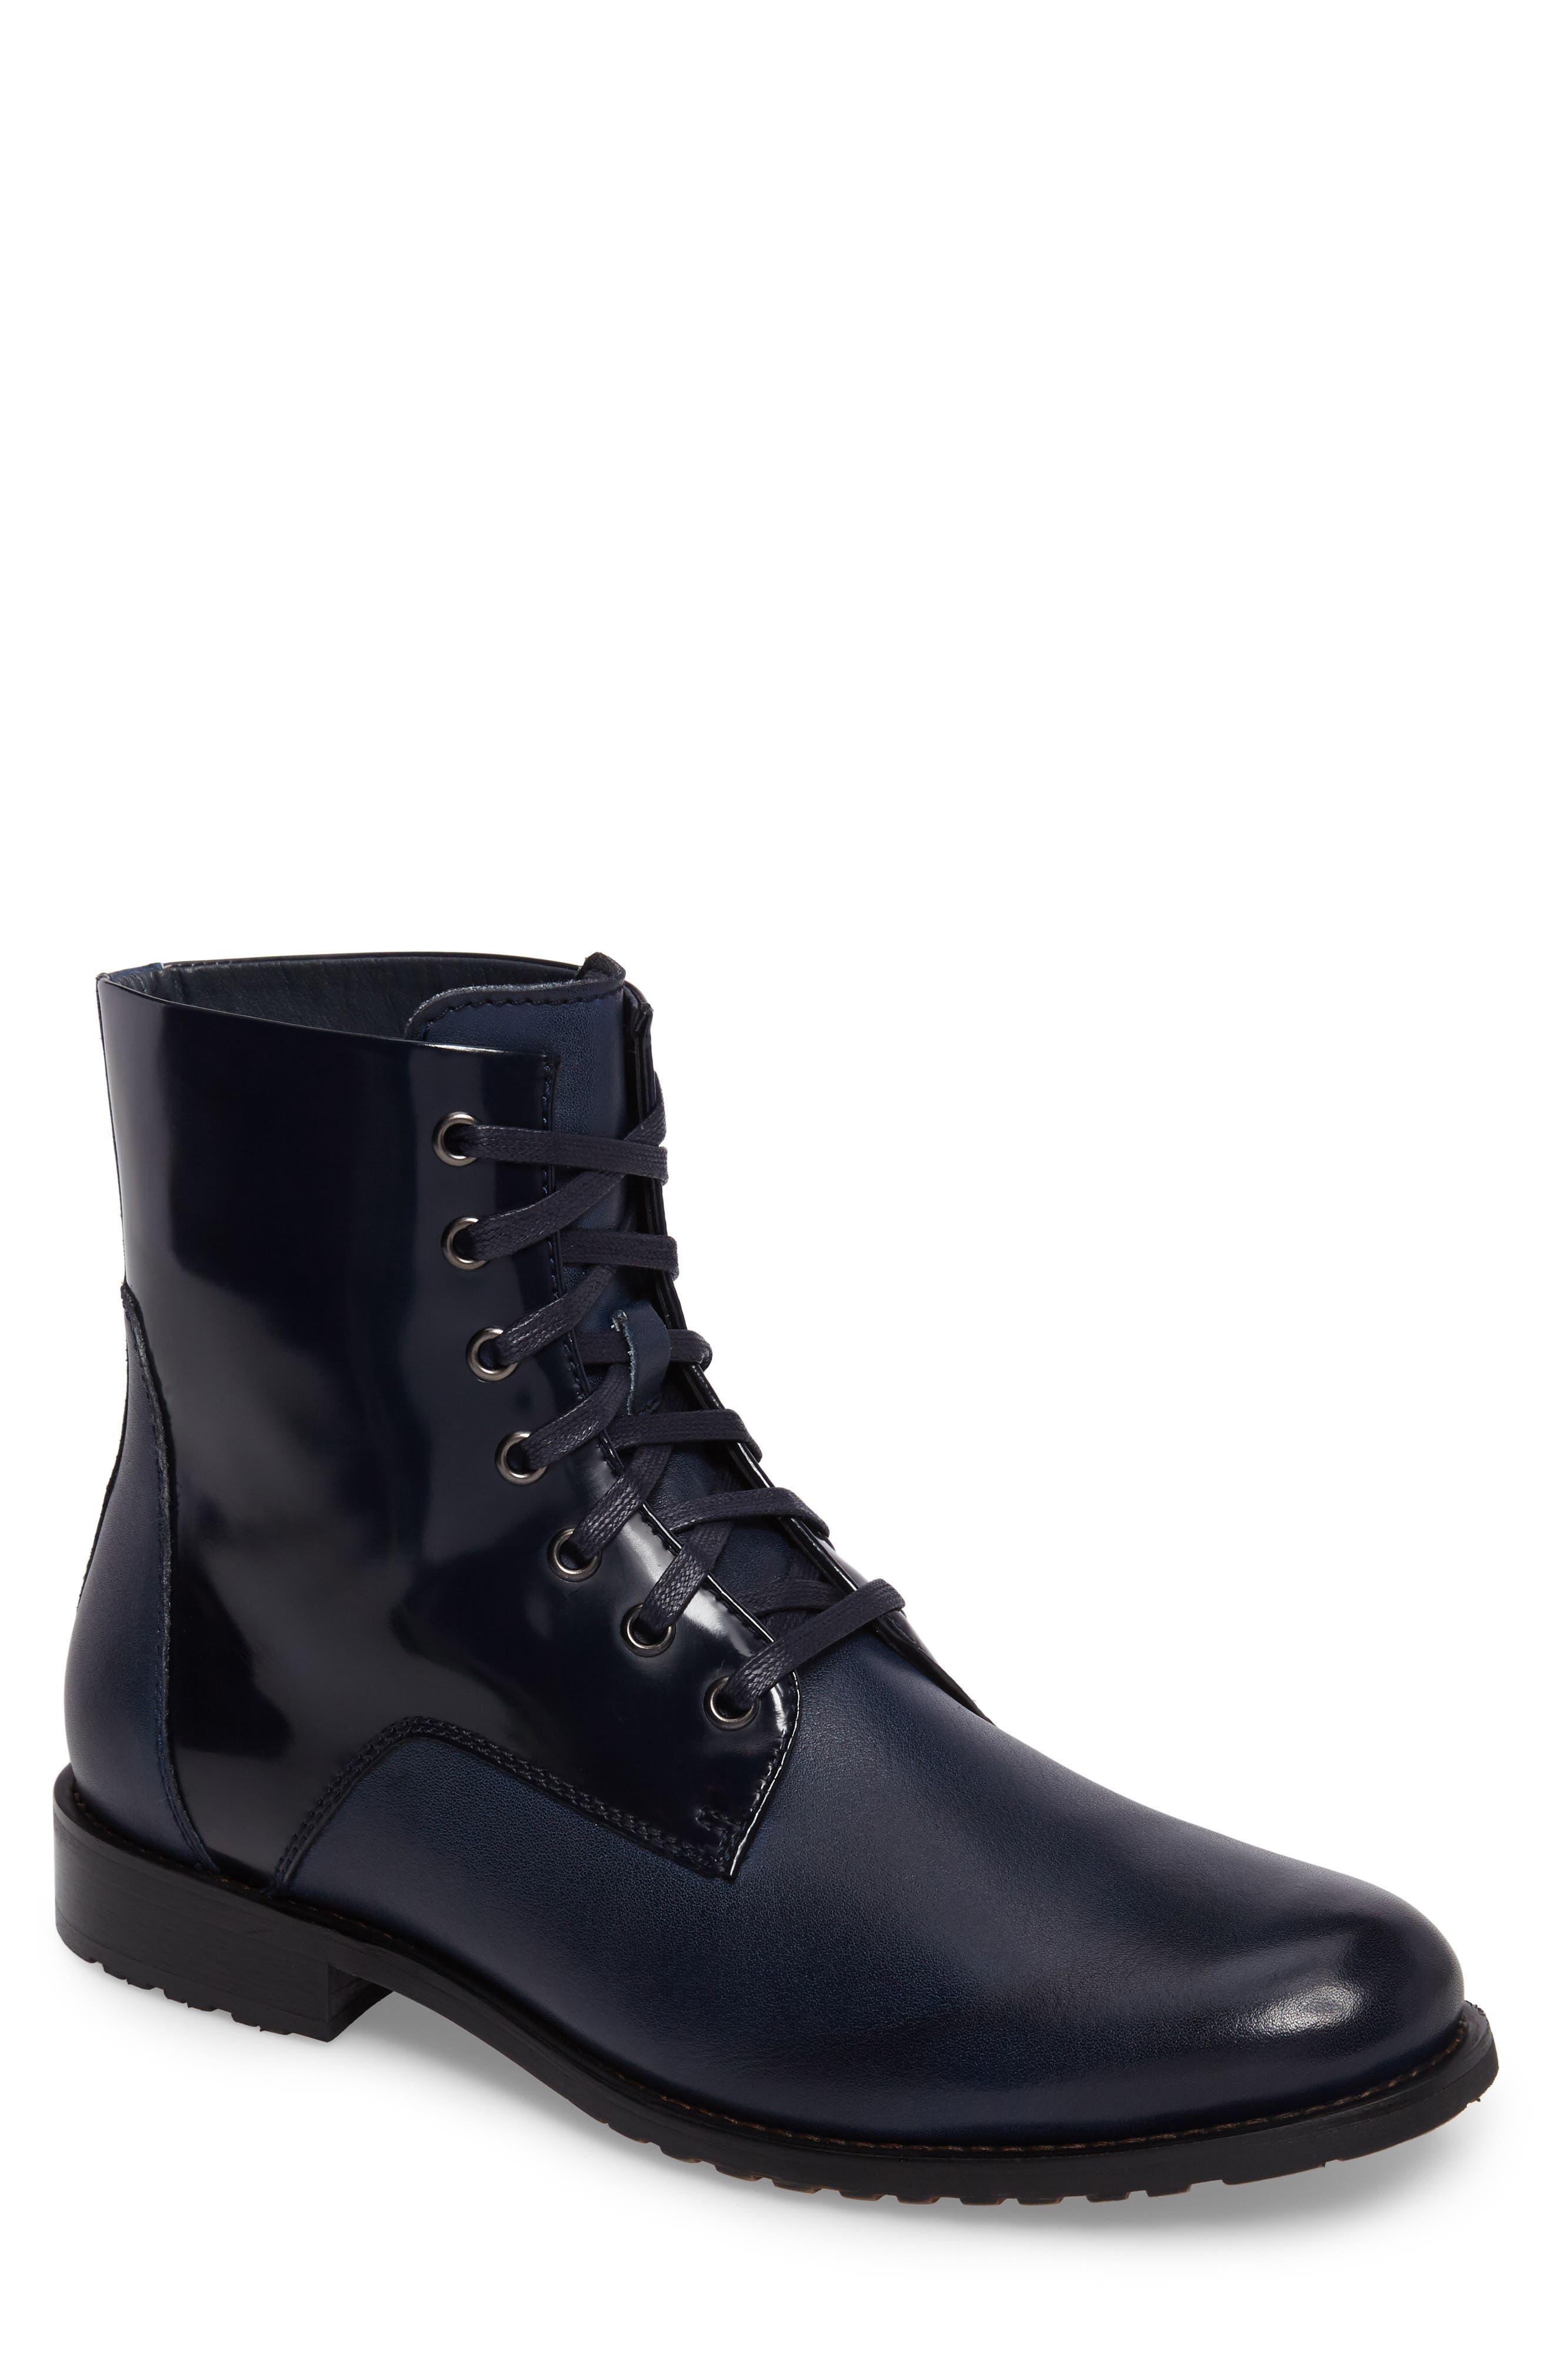 Main Image - English Laundry Athol Plain Toe Boot (Men)